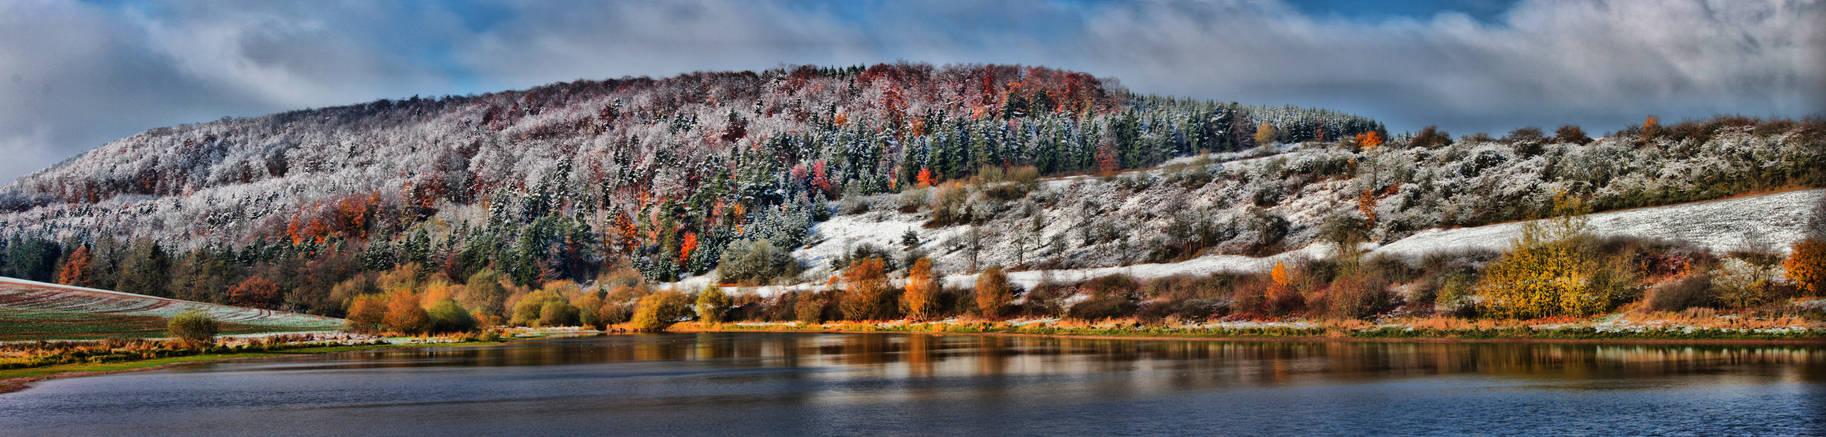 Snowy Autumn Morning (Pano)